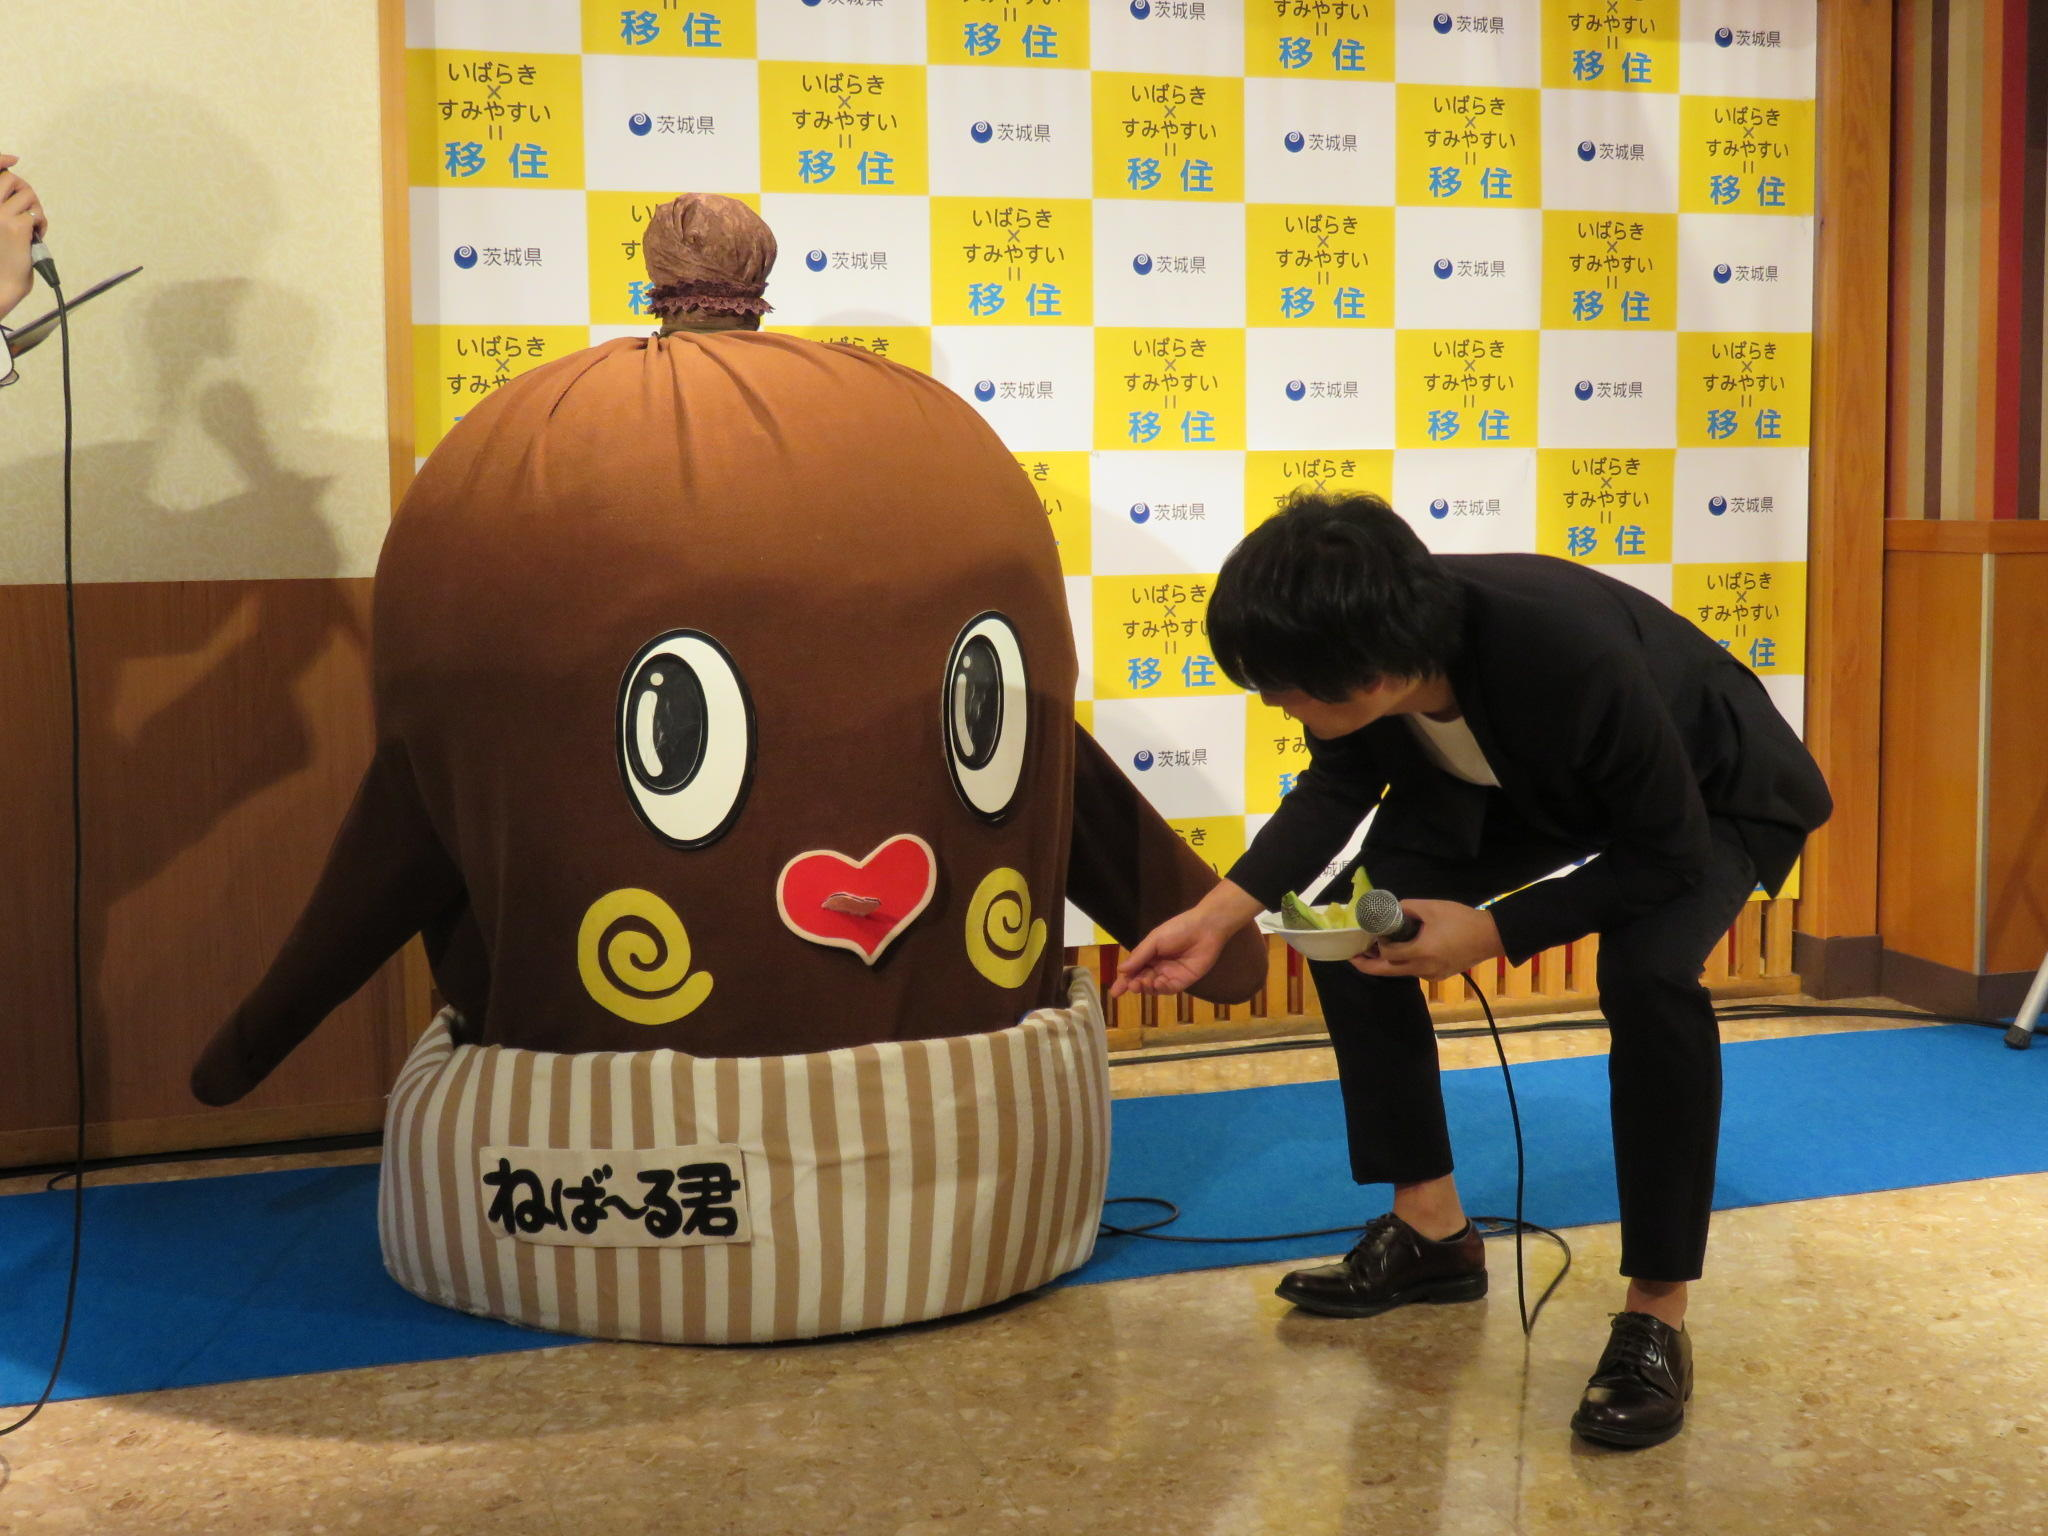 http://news.yoshimoto.co.jp/20160630165428-65ed8f90abff17021de96c8ee92fcad65fb5a2ff.jpg